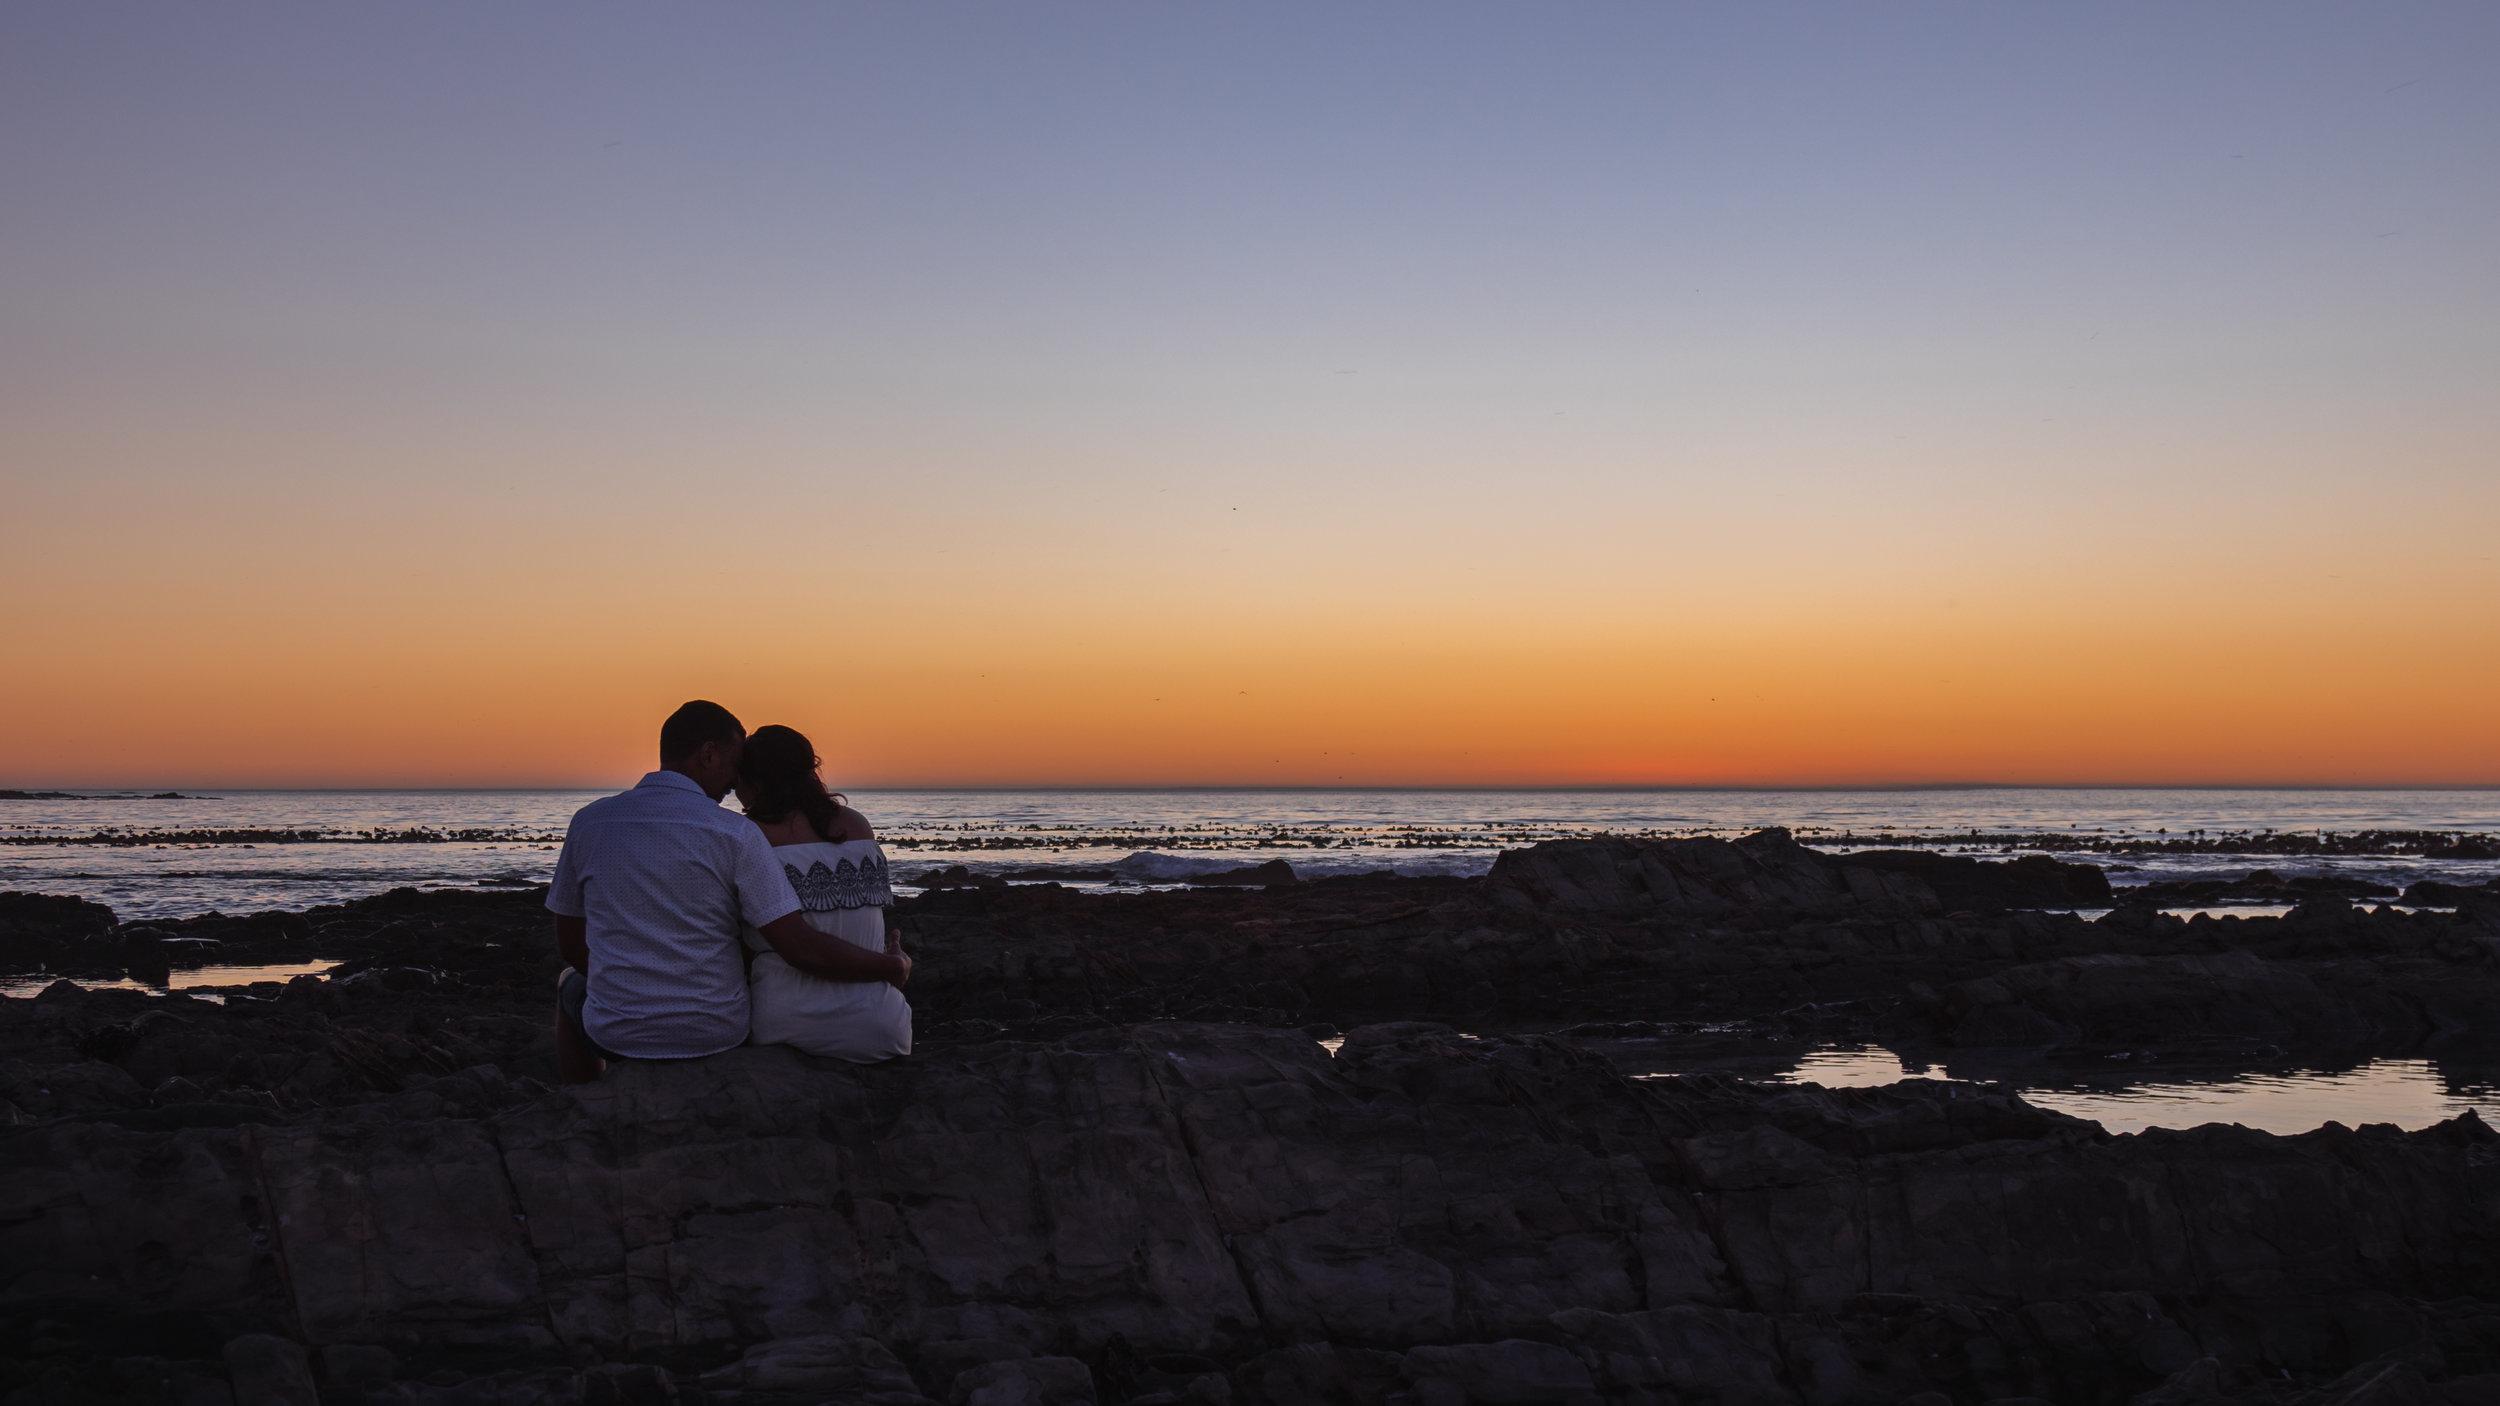 Carol Anne & Craig - Sunset Couples Shoot - Seap Point Cape Town - photo by Ken Treloar Photography-71.jpg